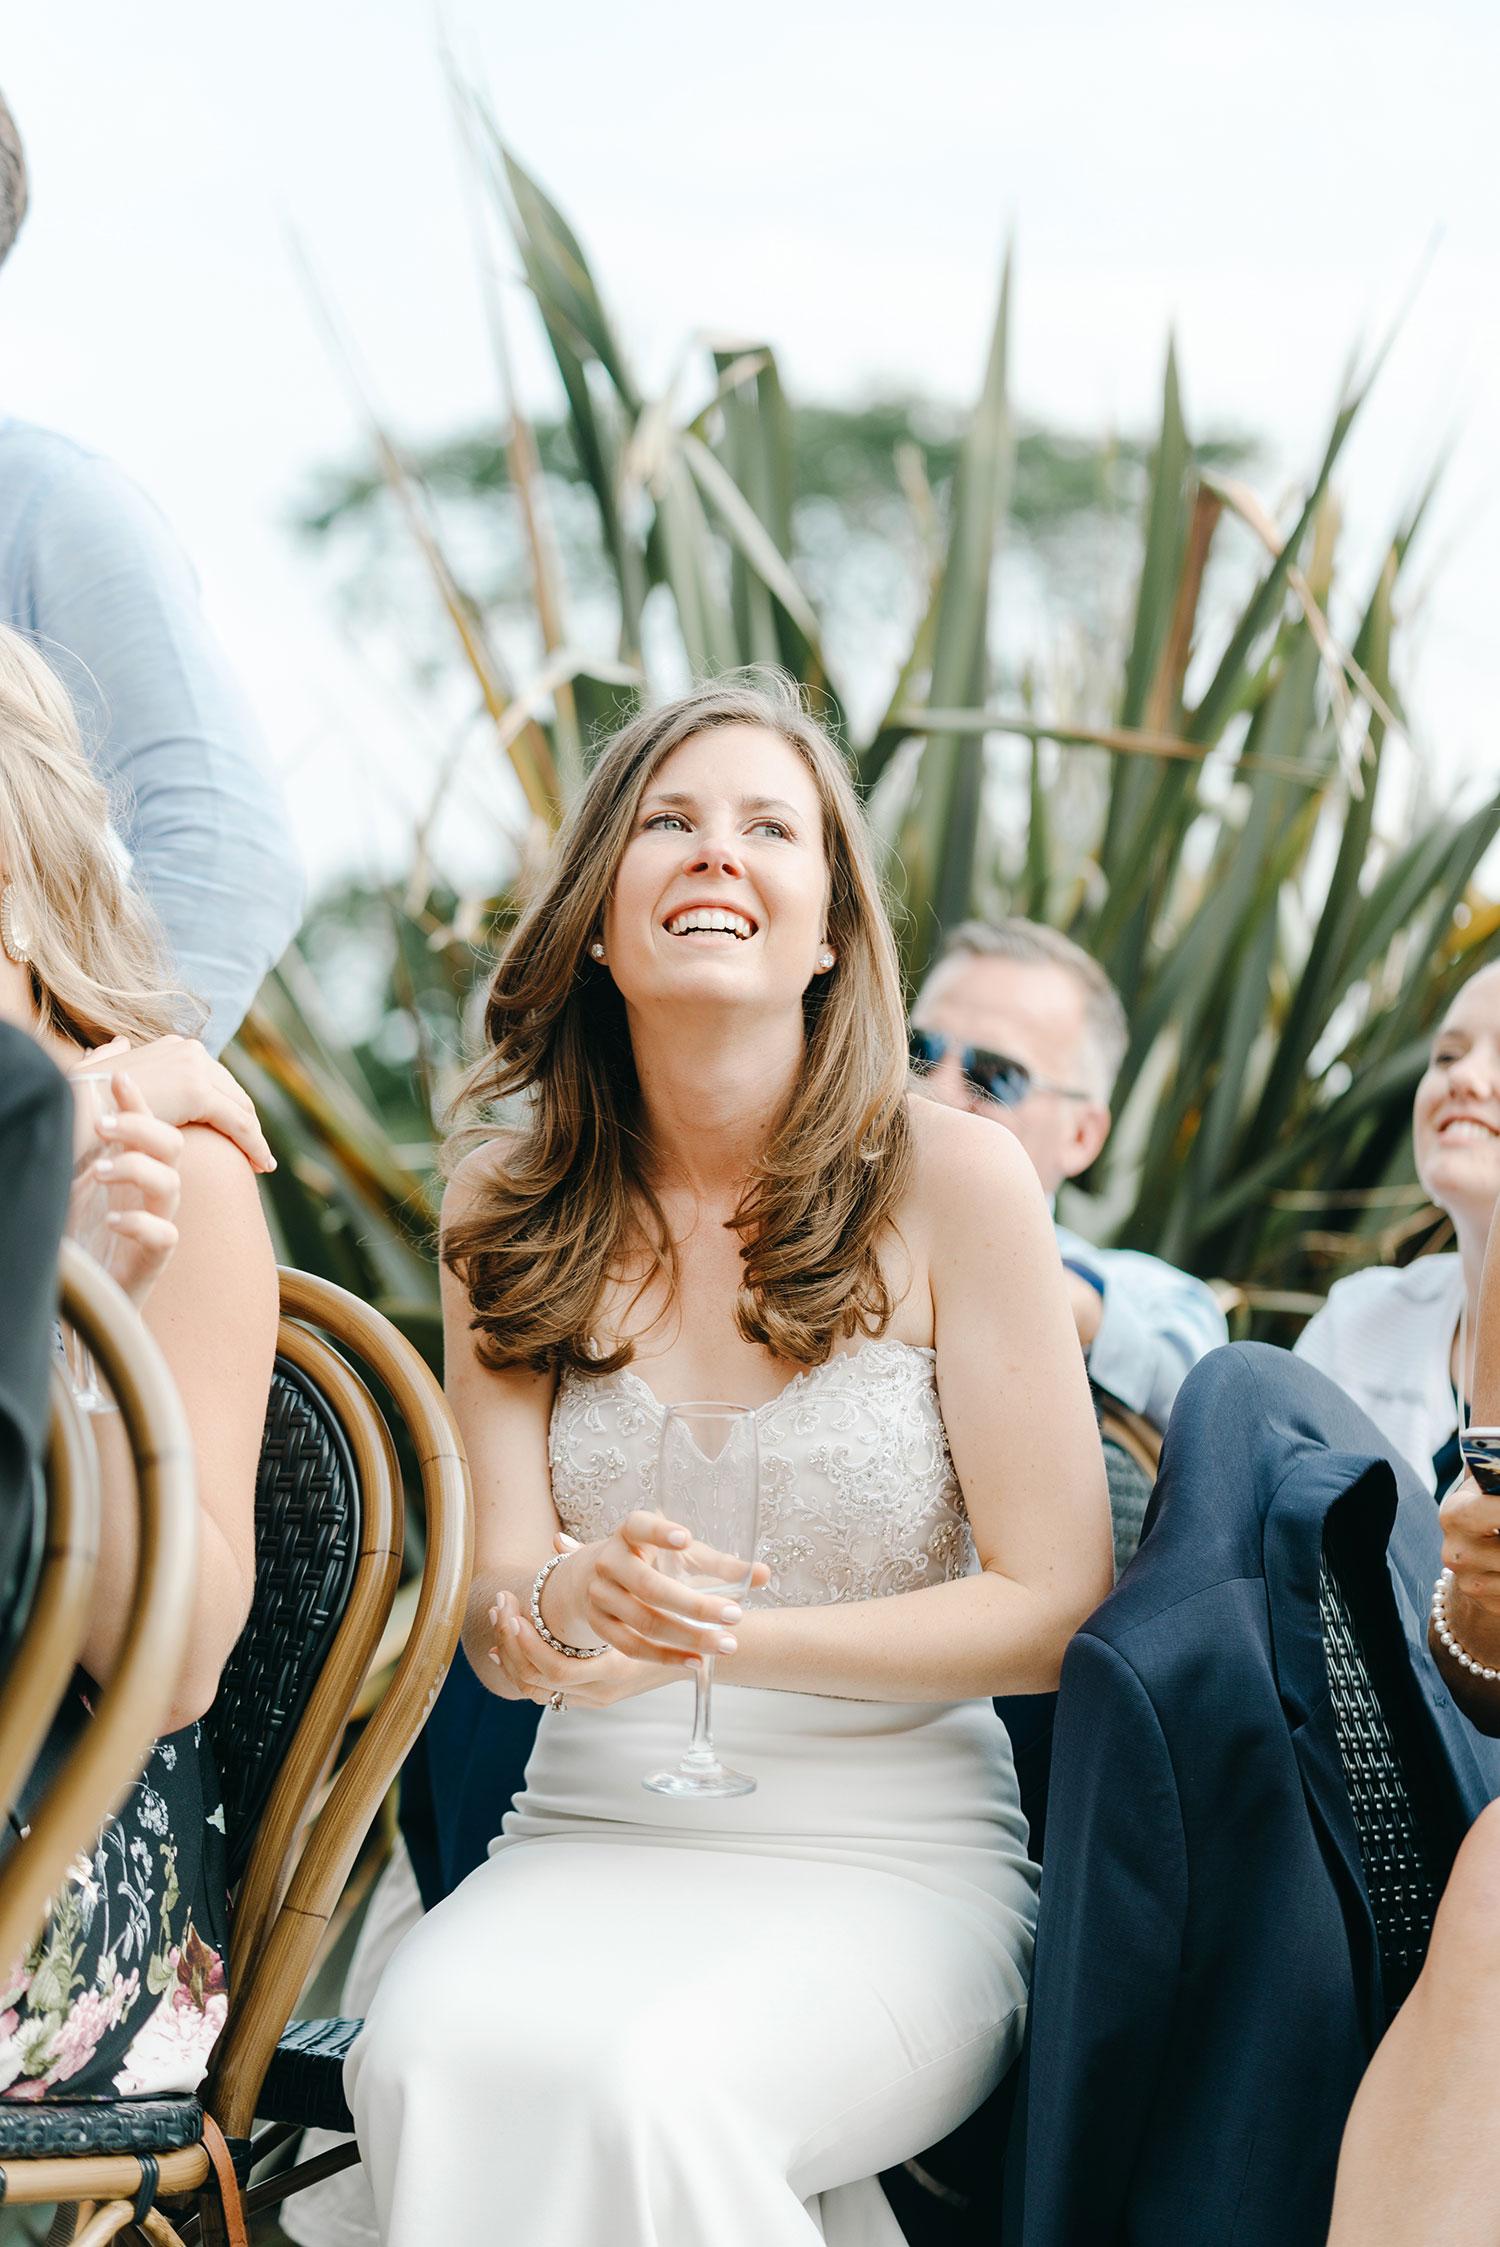 destination-wedding-photographer-ballinacurra-house-wedding-20180711_0098.jpg